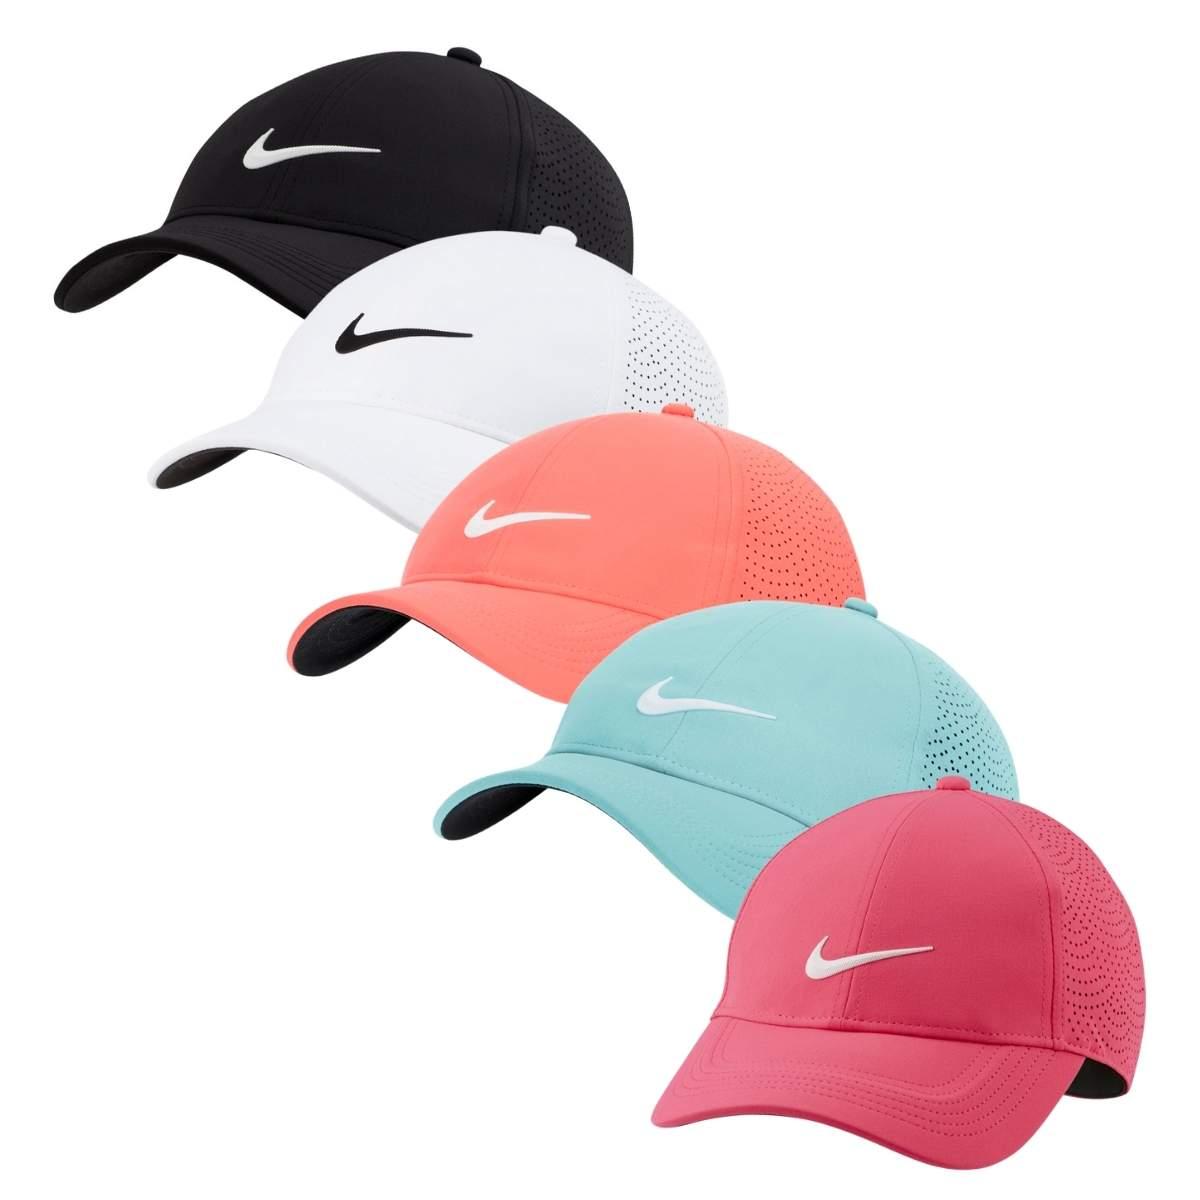 Nike Women's 2021 Aerobill Heritage86 Golf Hat